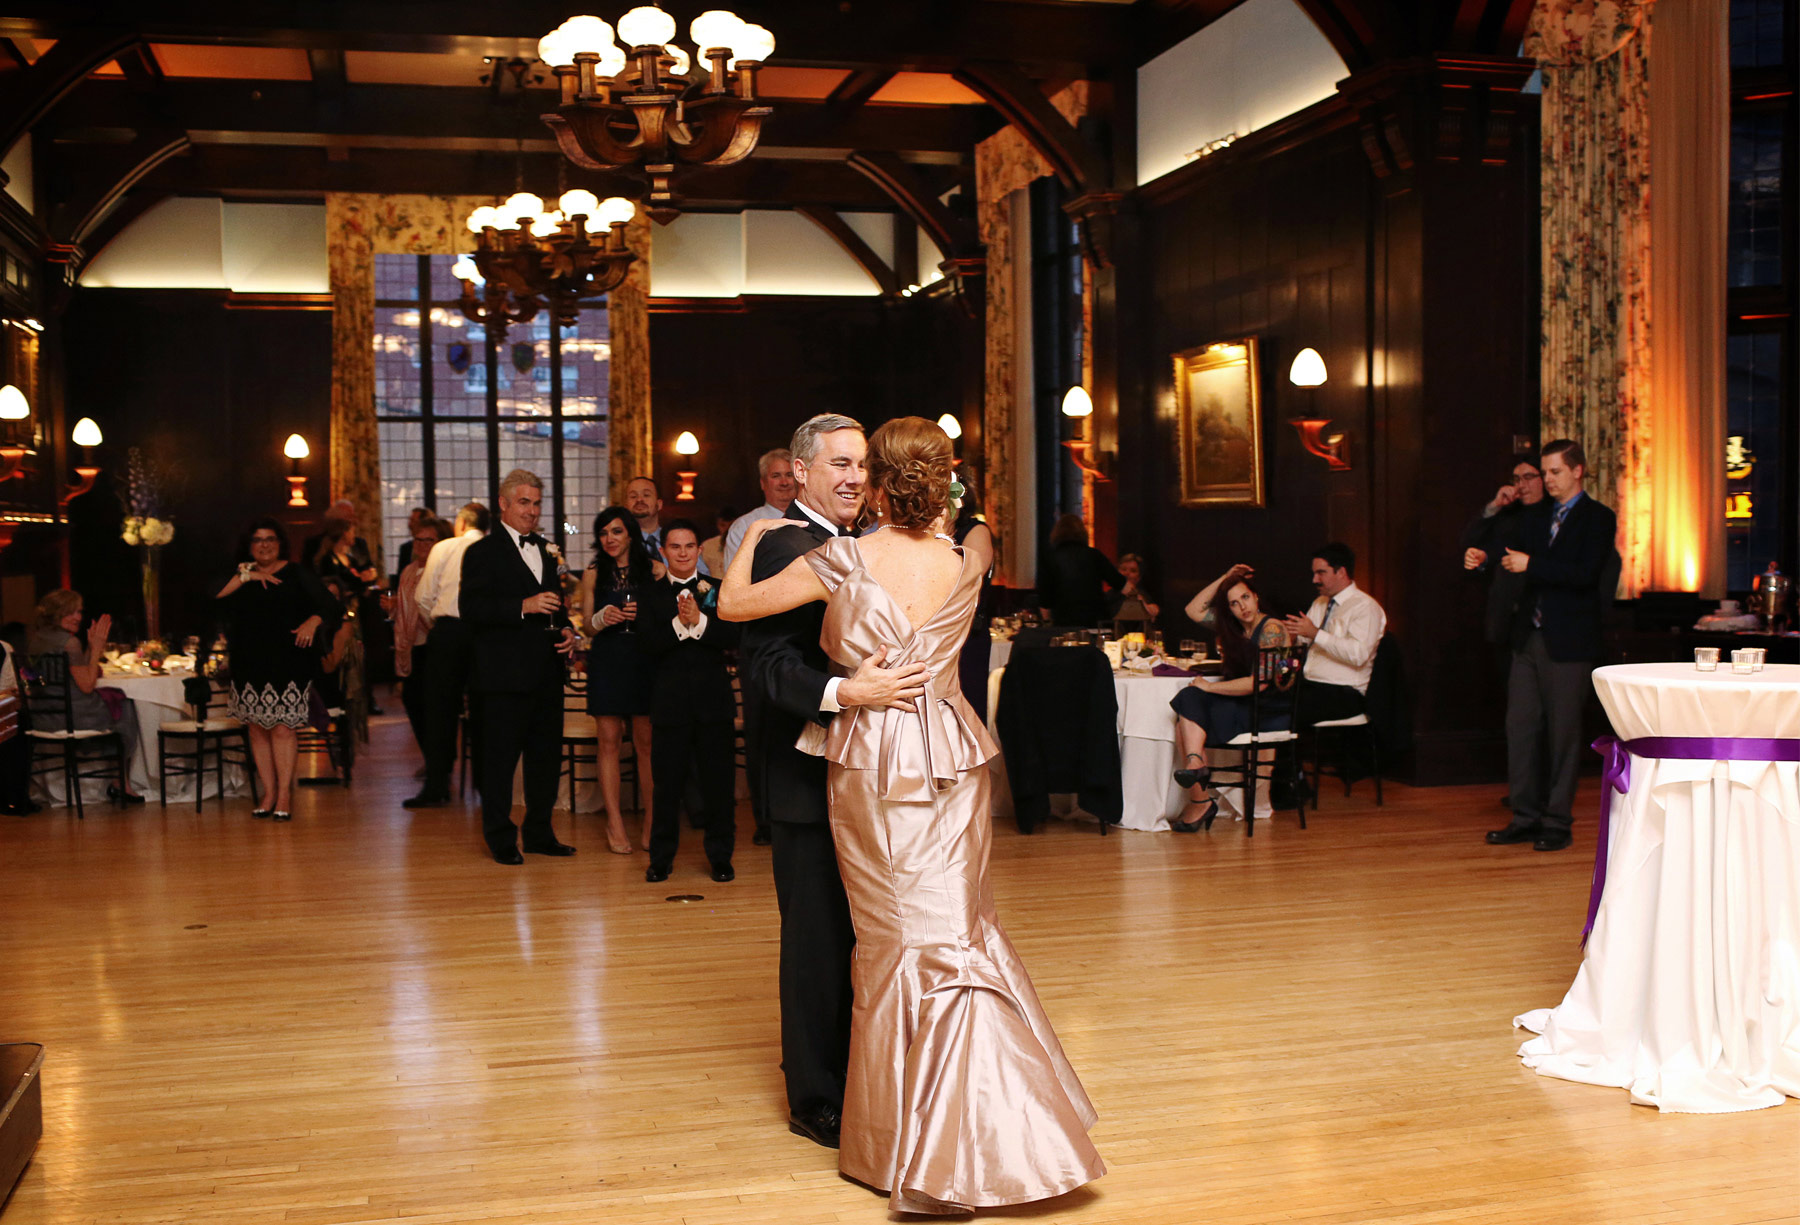 13-Minneapolis-Minnesota-Wedding-Photography-by-Vick-Photography-Downtown-The-Minneapolis-Club-Mansion-Reception-First-Dance-Tonia-and-Paul.jpg